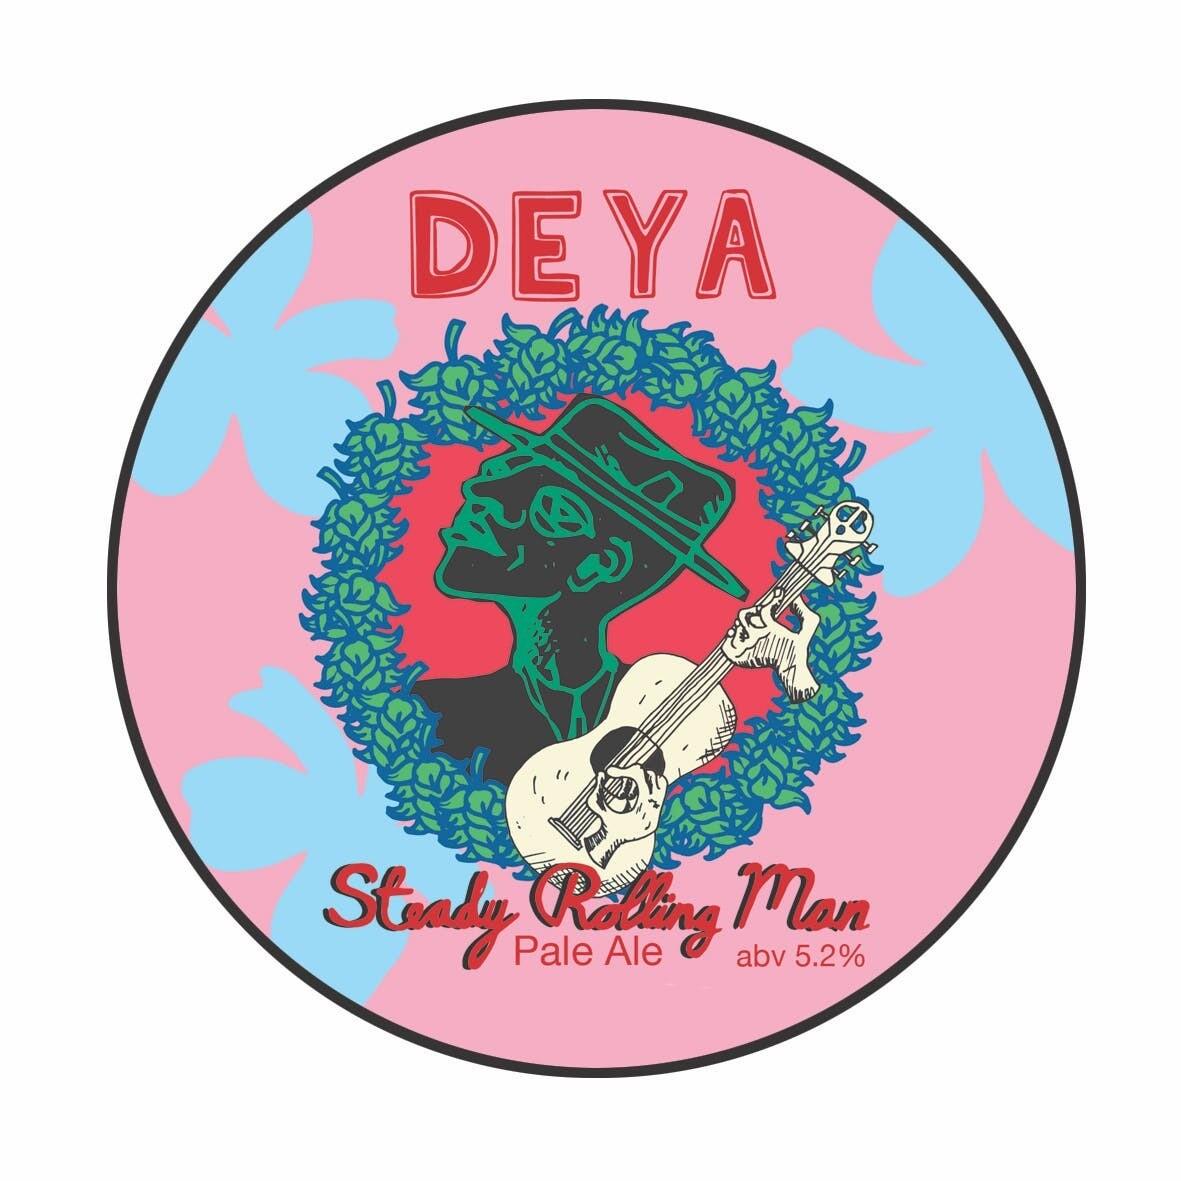 Deya Steady Rolling Man Pale Ale (1.5 or 4 Pints)